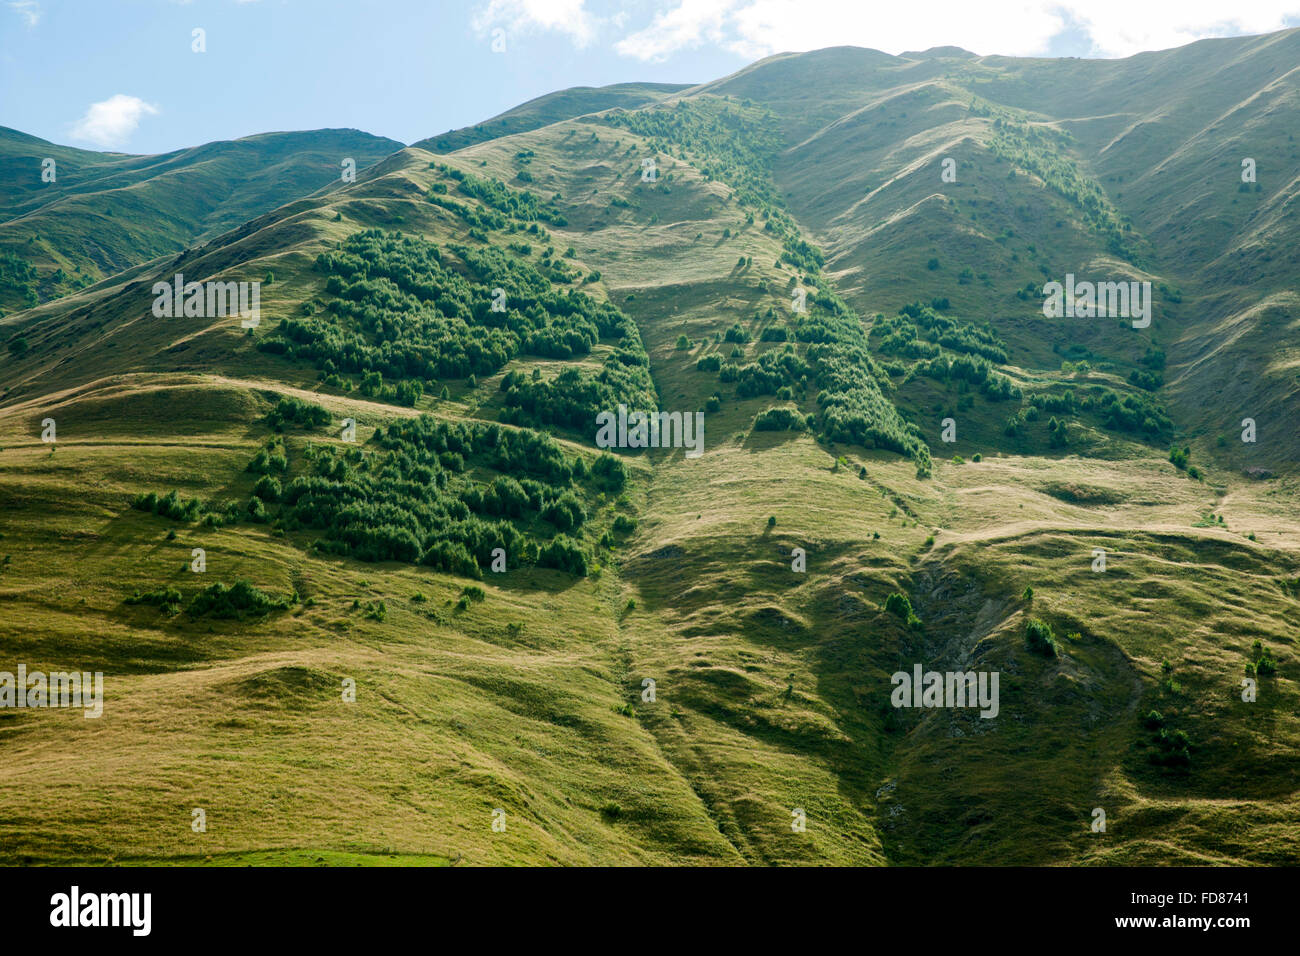 Georgien, Mzcheta-Mtianeti, Im Sno-Tal Südlich von Stepansminda. Stockbild